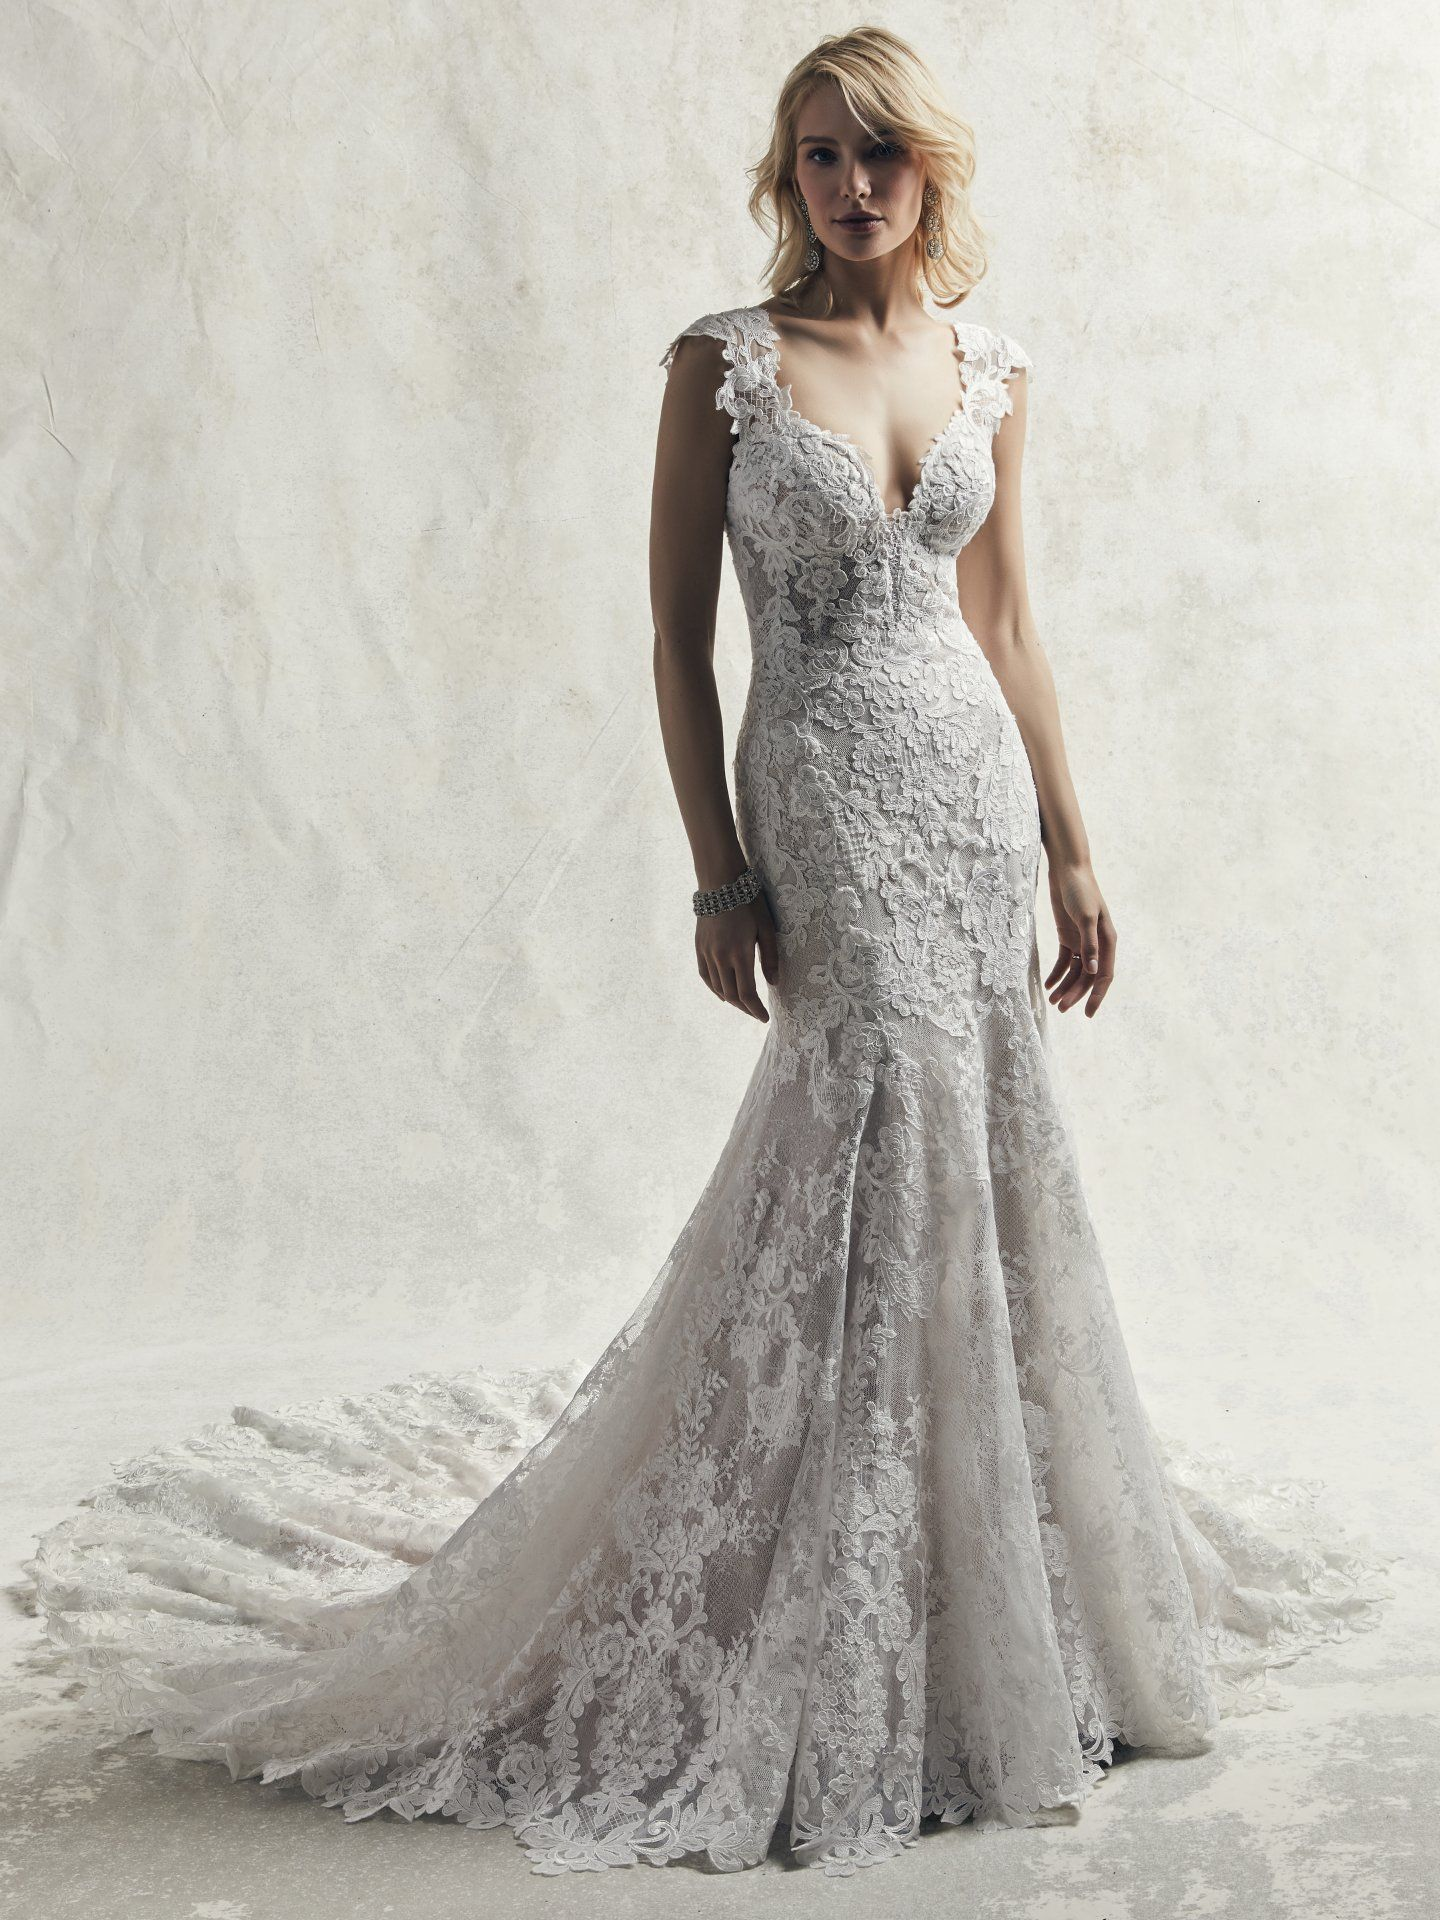 abaf61033a8 Chauncey Wedding Dress by Sottero   Midgley An ultra-romantic lace wedding  gown